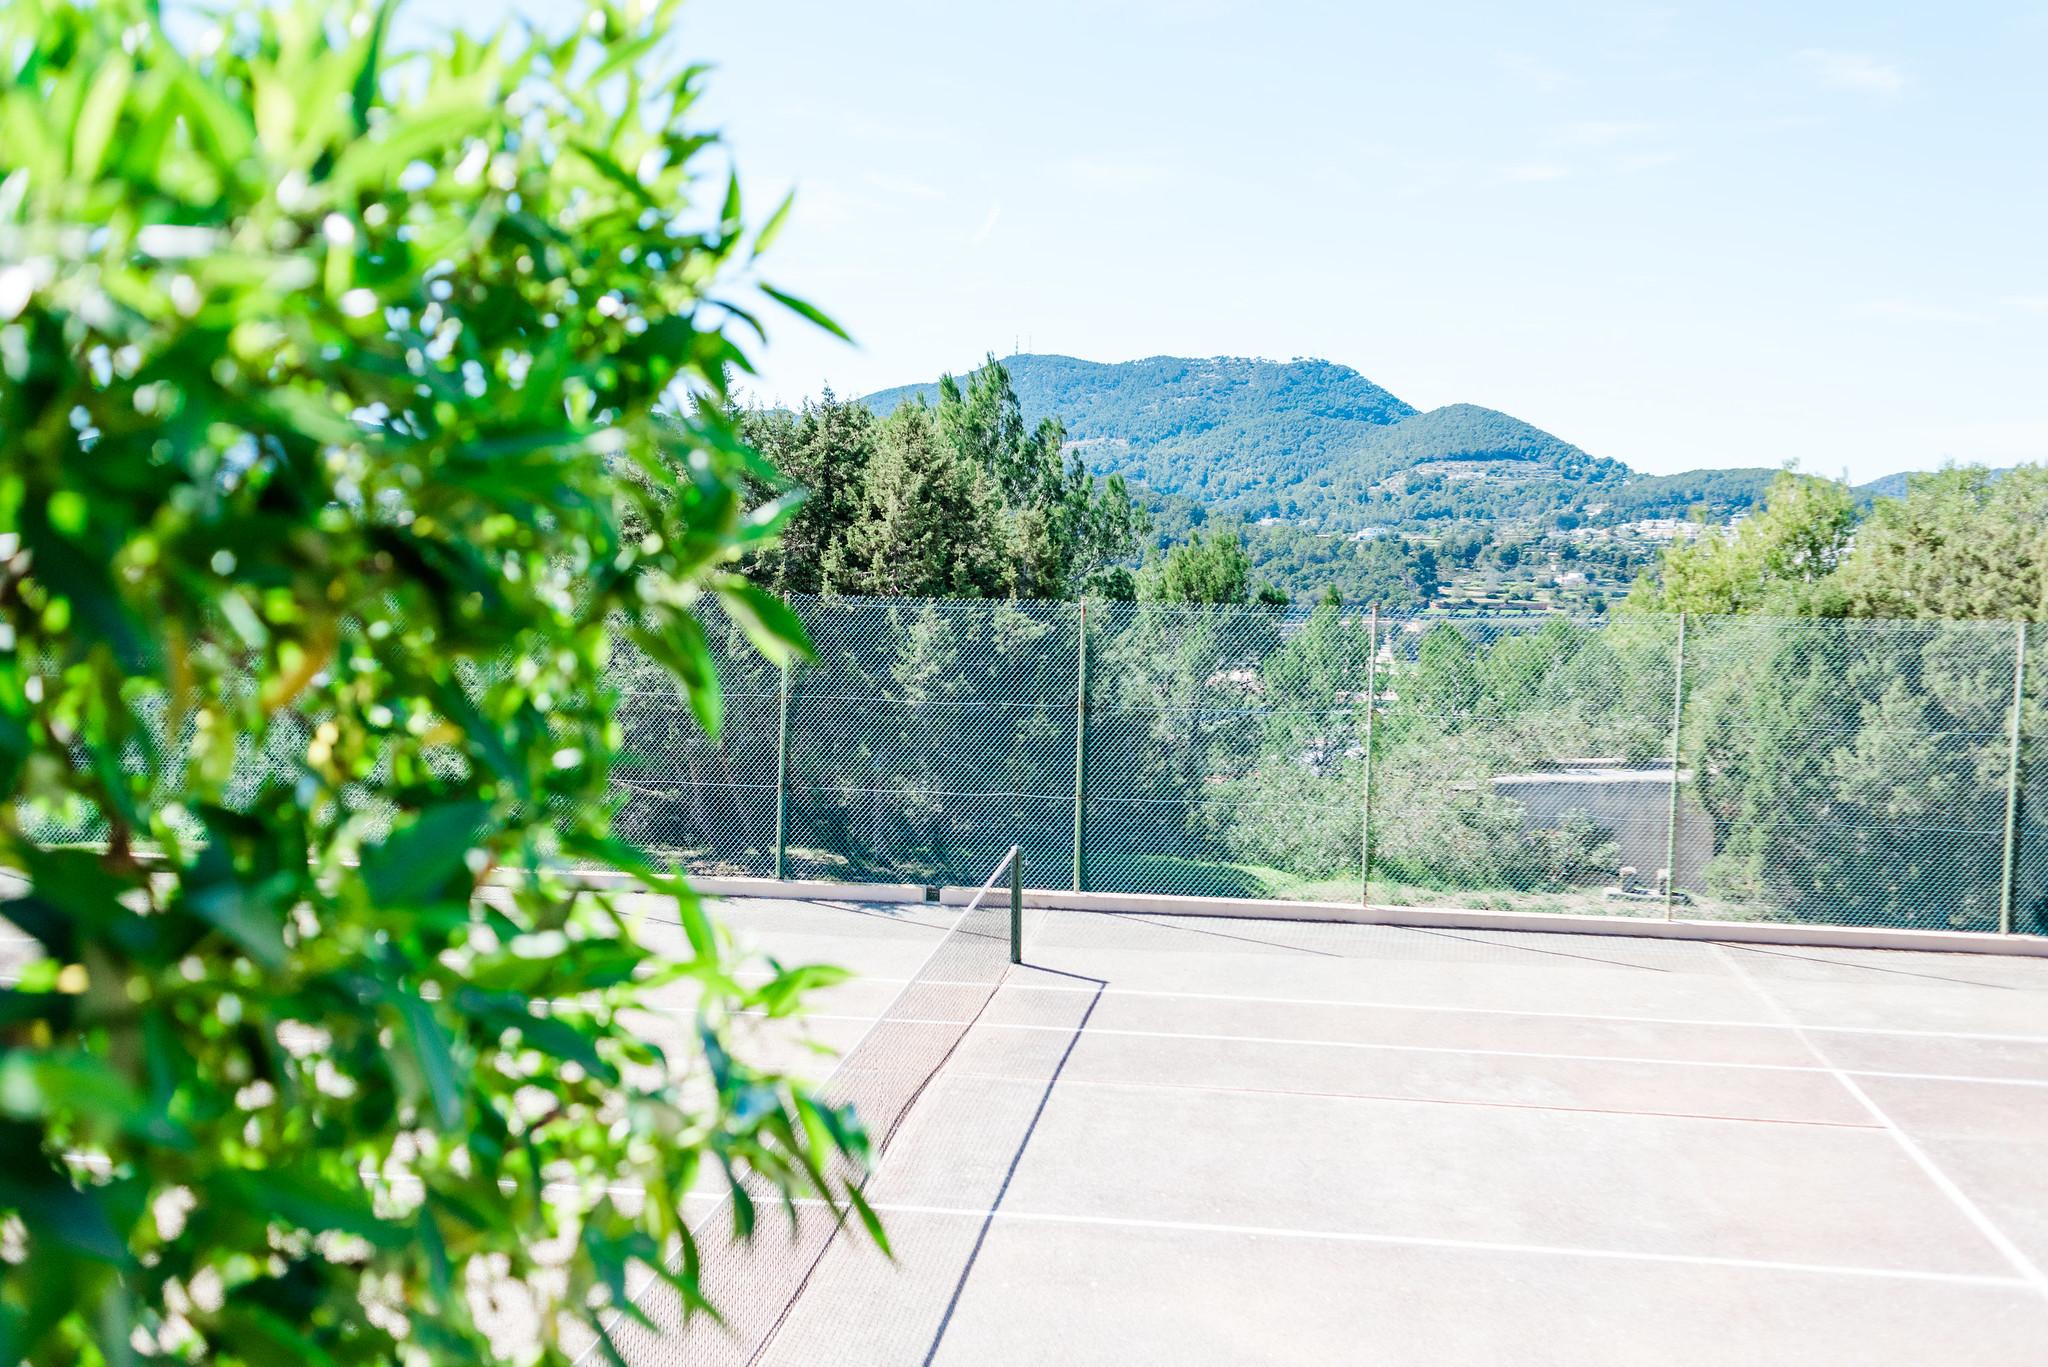 https://www.white-ibiza.com/wp-content/uploads/2020/06/white-ibiza-villas-villa-andrea-exterior-tennis-court.jpg